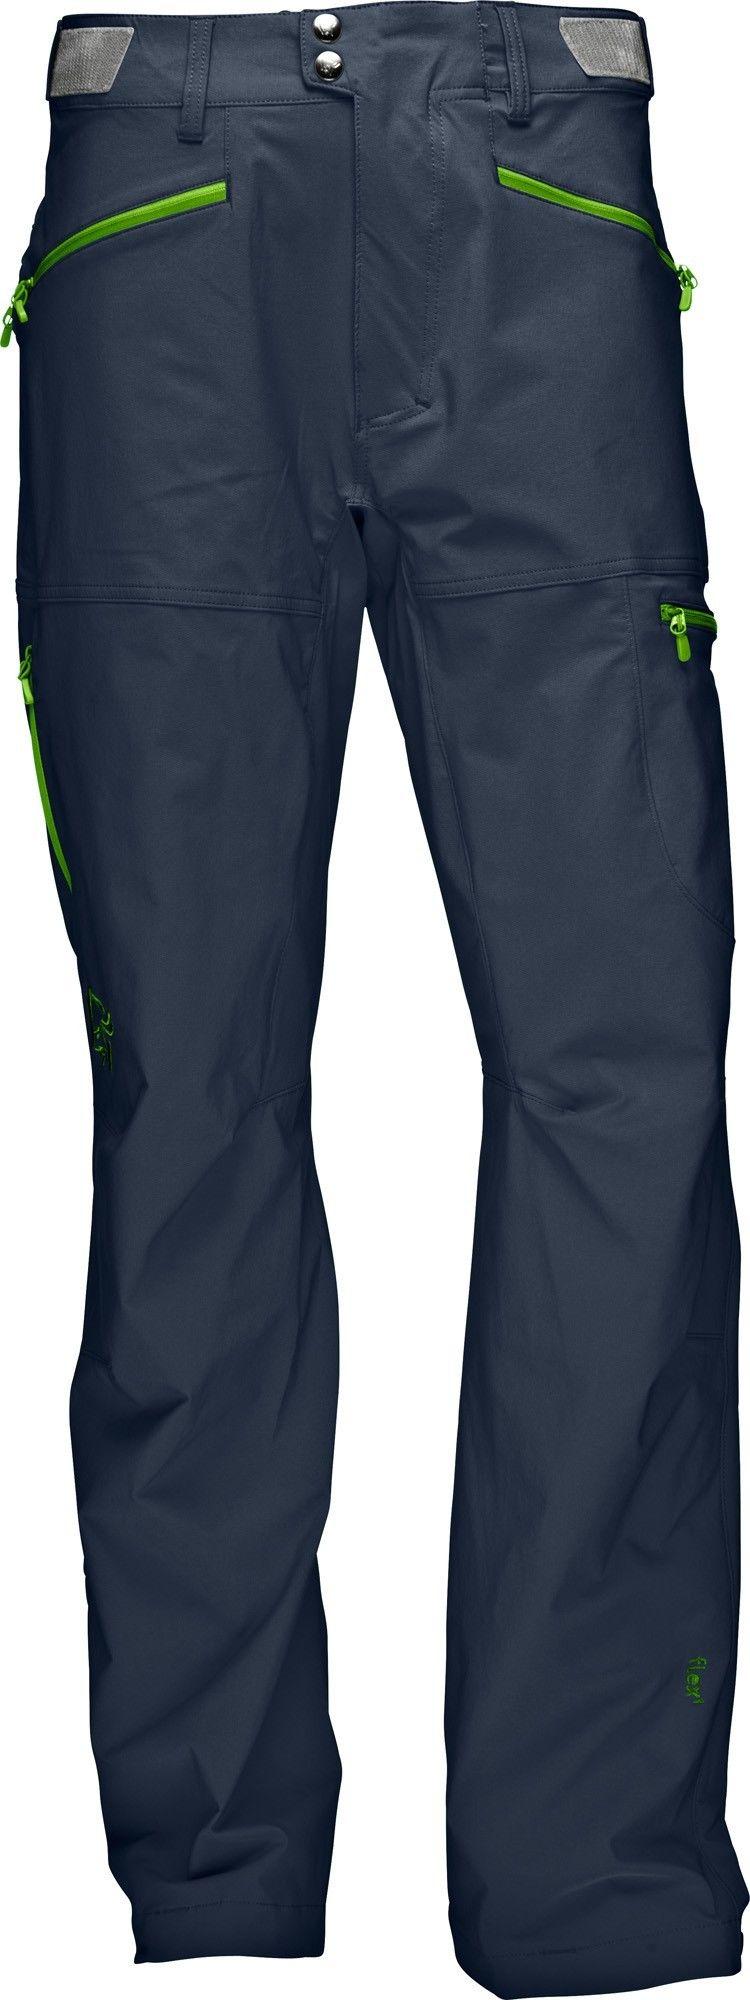 Norrona Falketind Flex1 Pants Blau, Male XL -Farbe Cool Black, XL